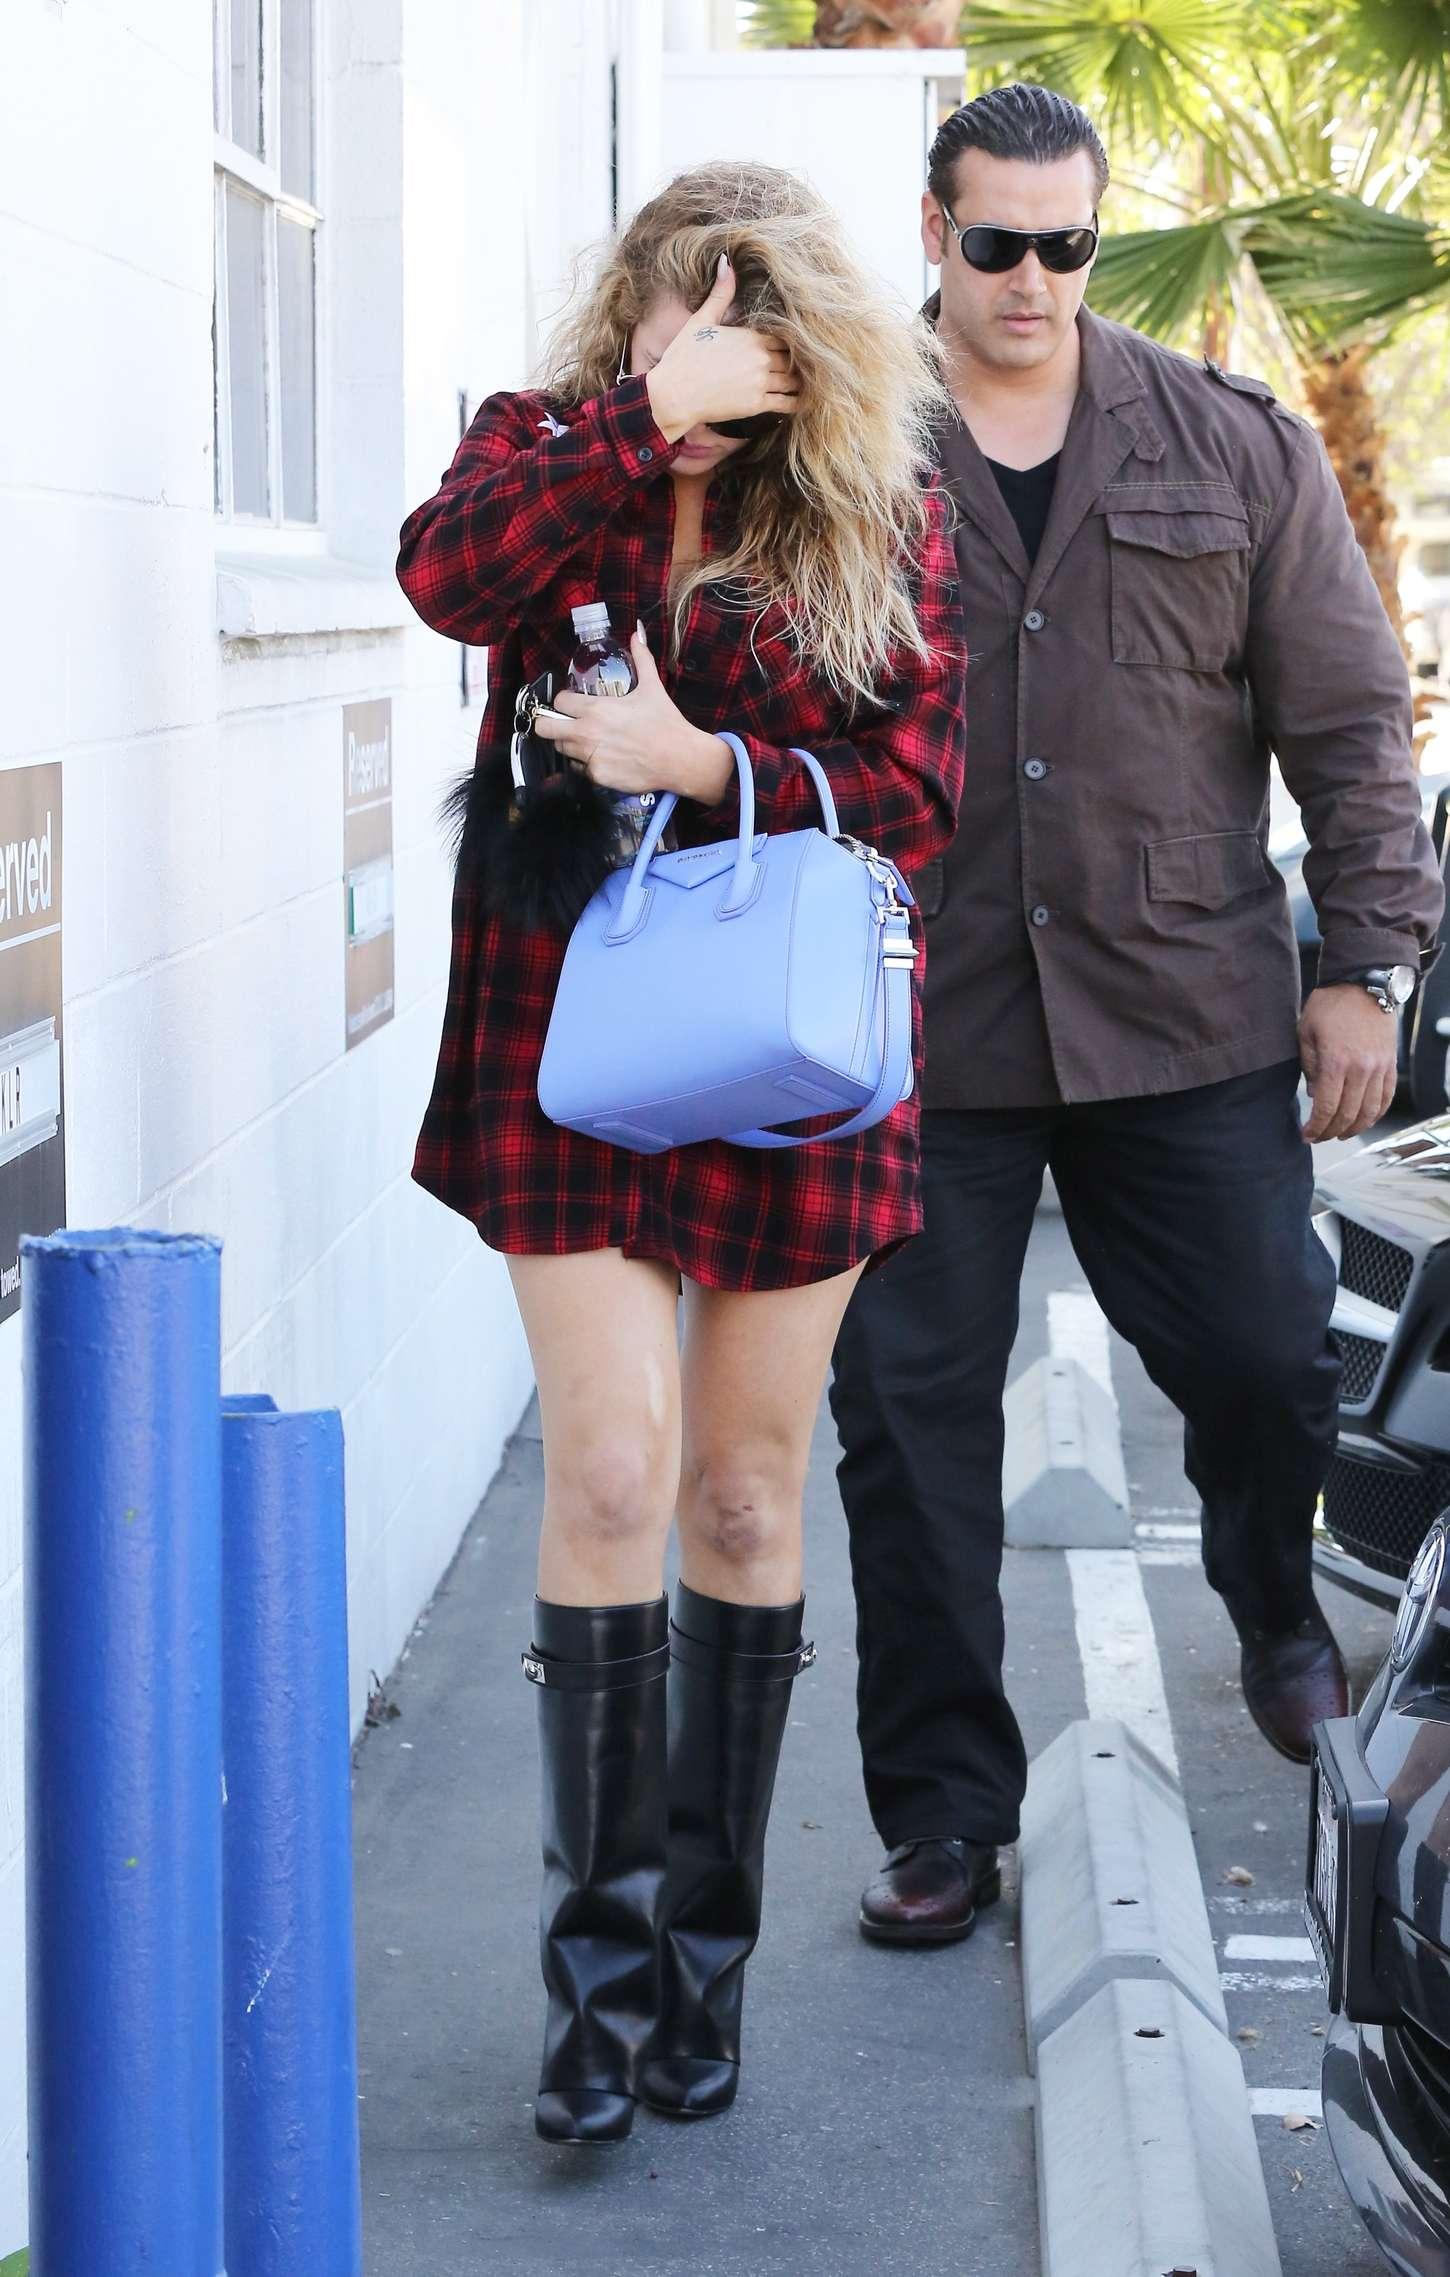 Khloe Kardashian 2015 : Khloe Kardashian in Red Shirt -01